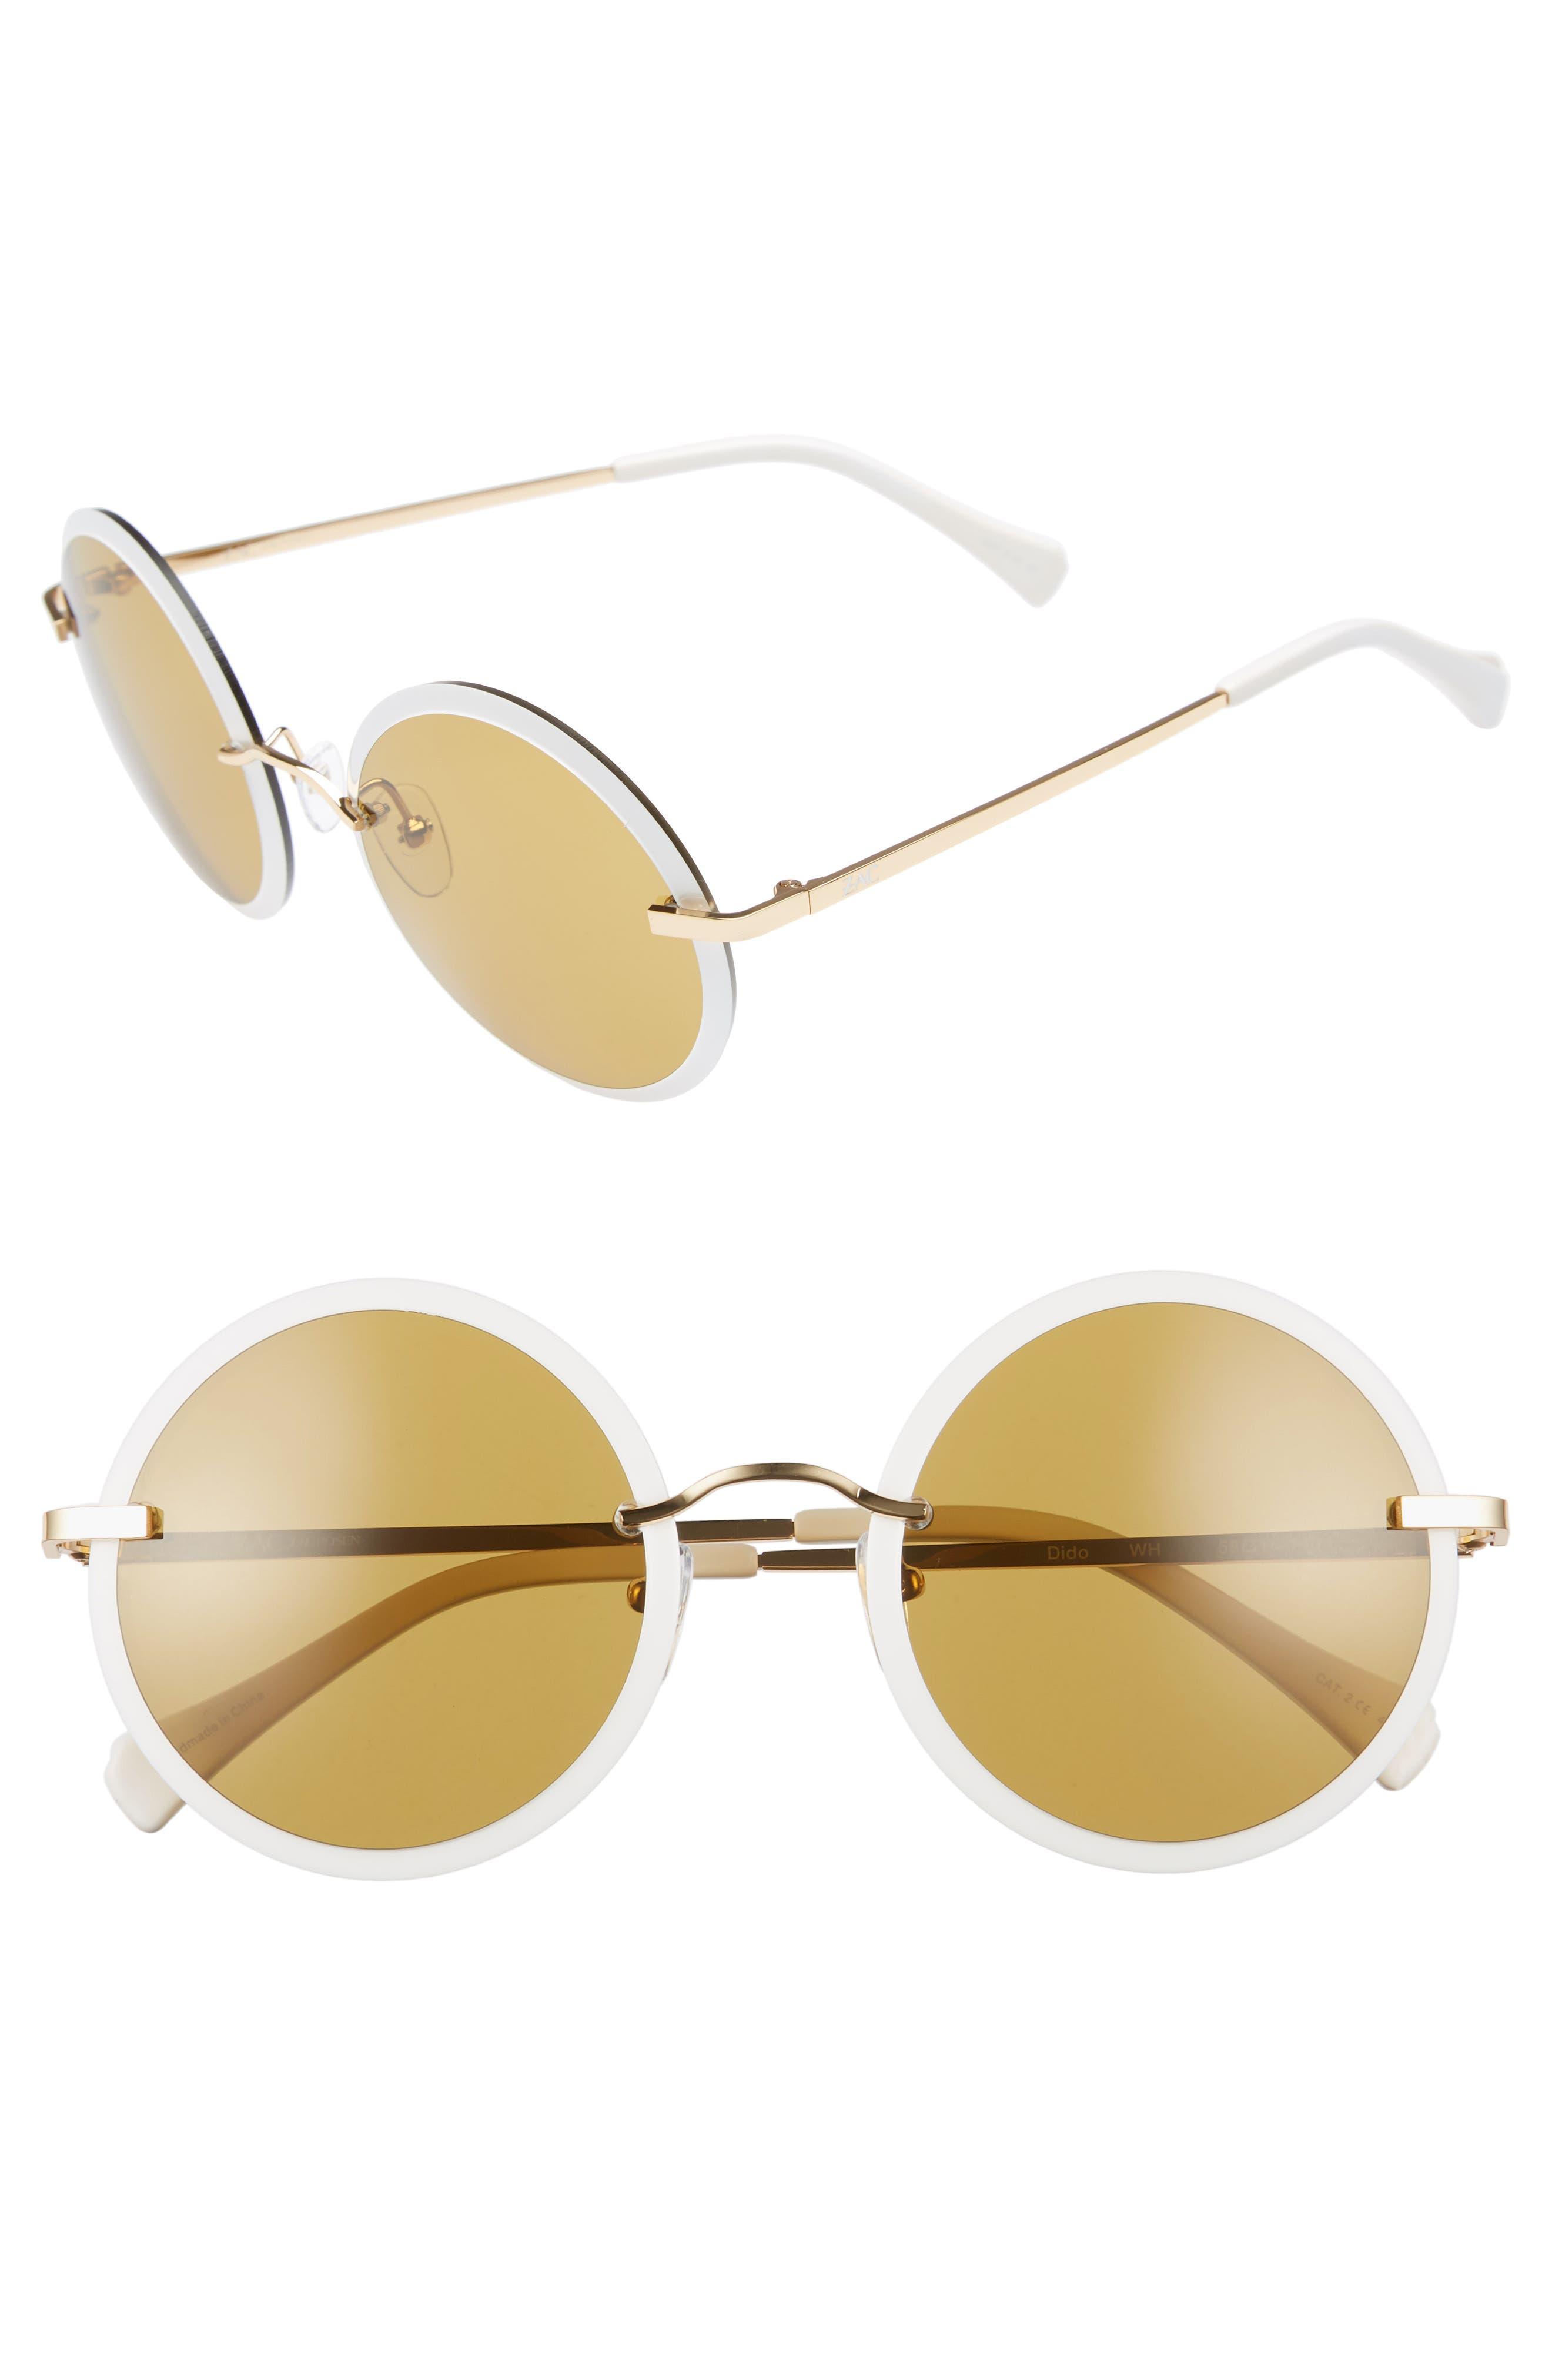 Dido 58mm Sunglasses,                             Main thumbnail 1, color,                             White/ Gold